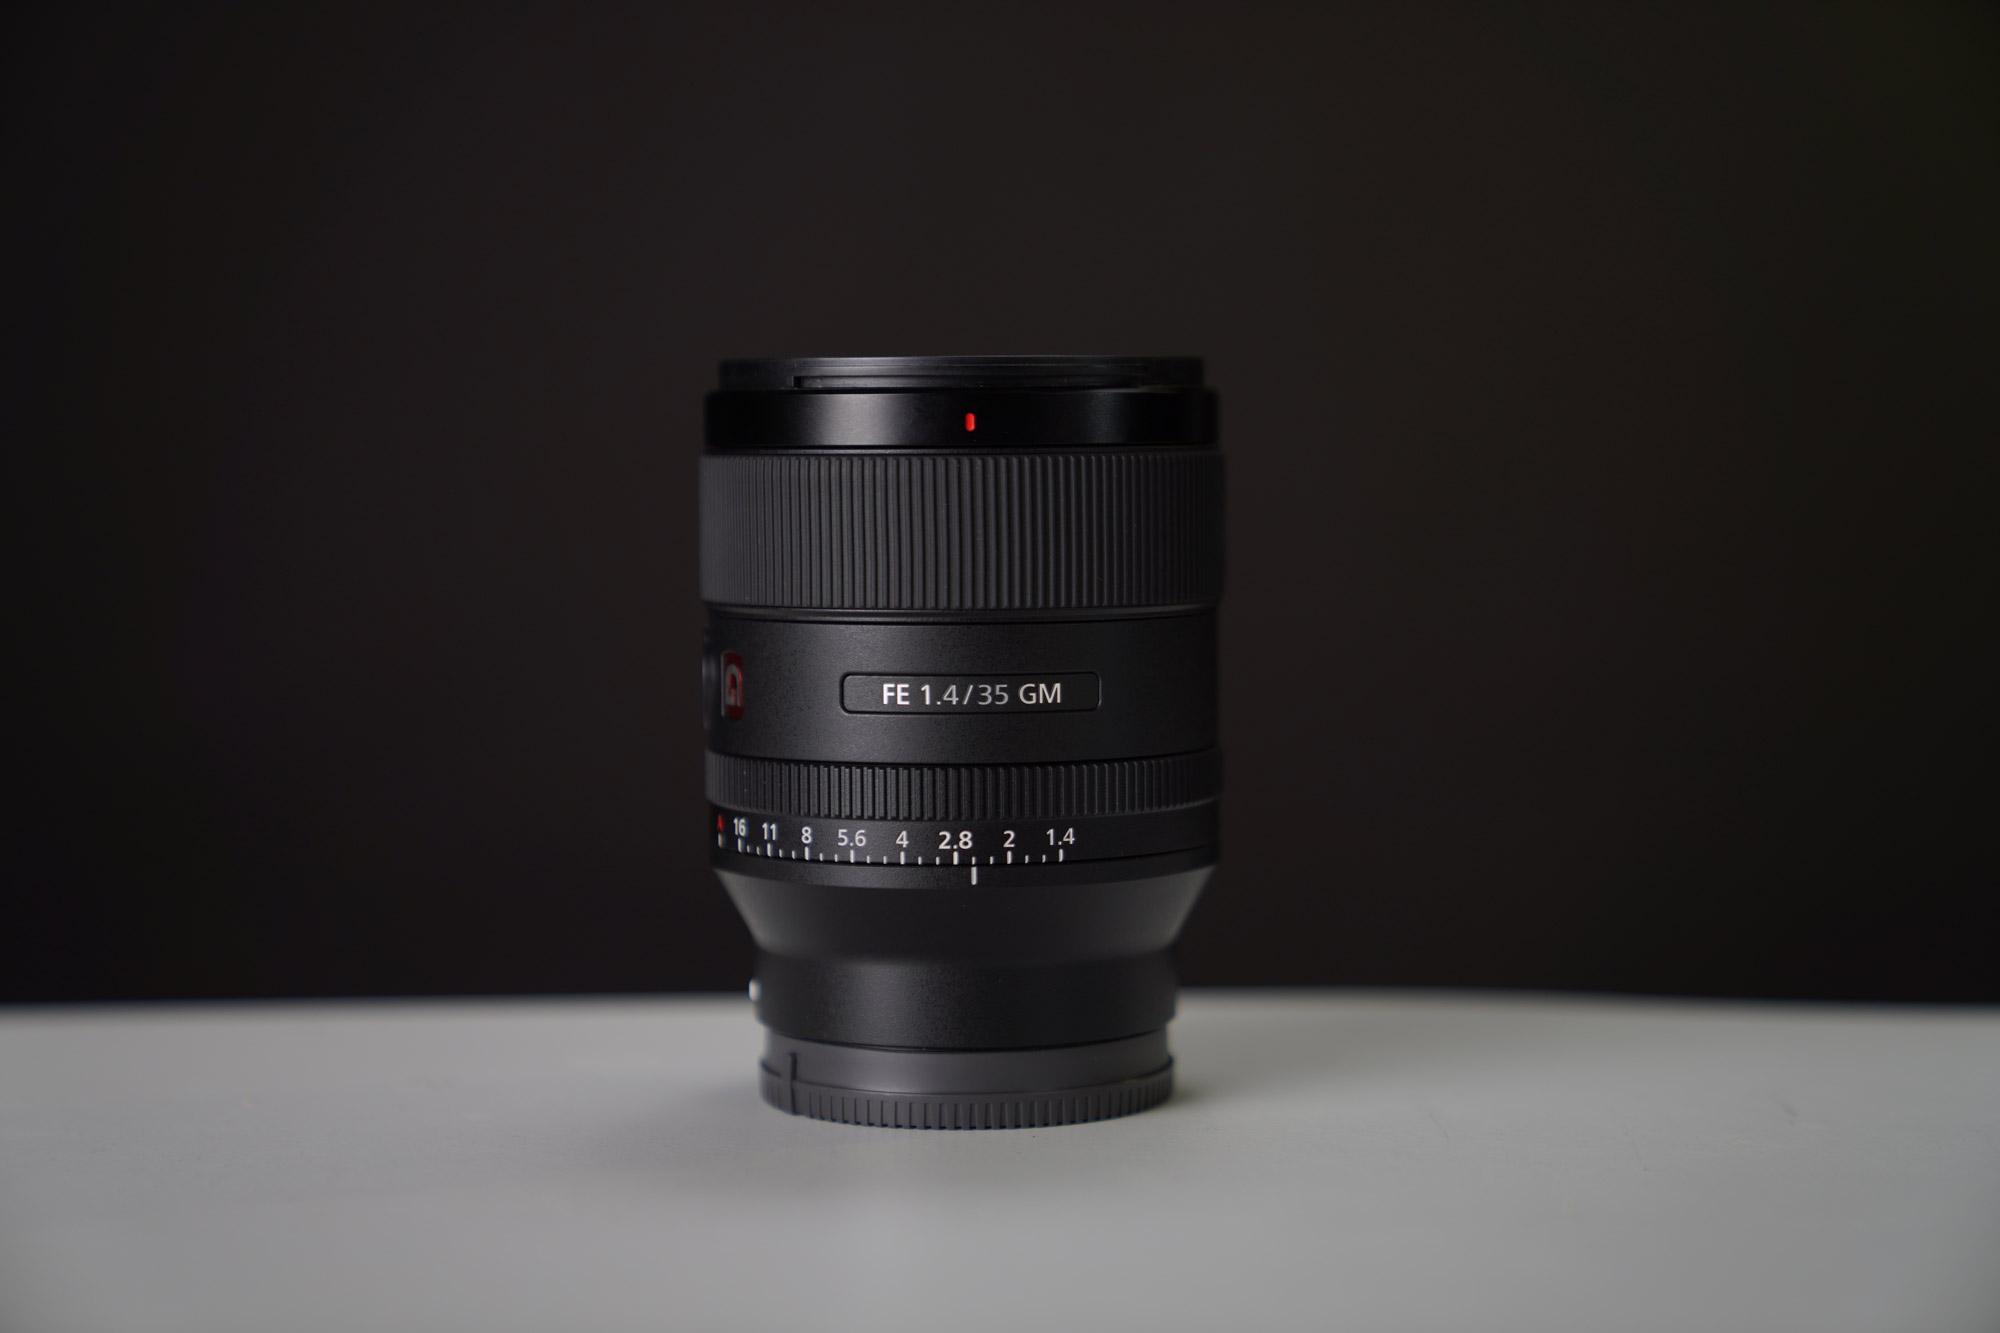 Sony 35mm f/1.4